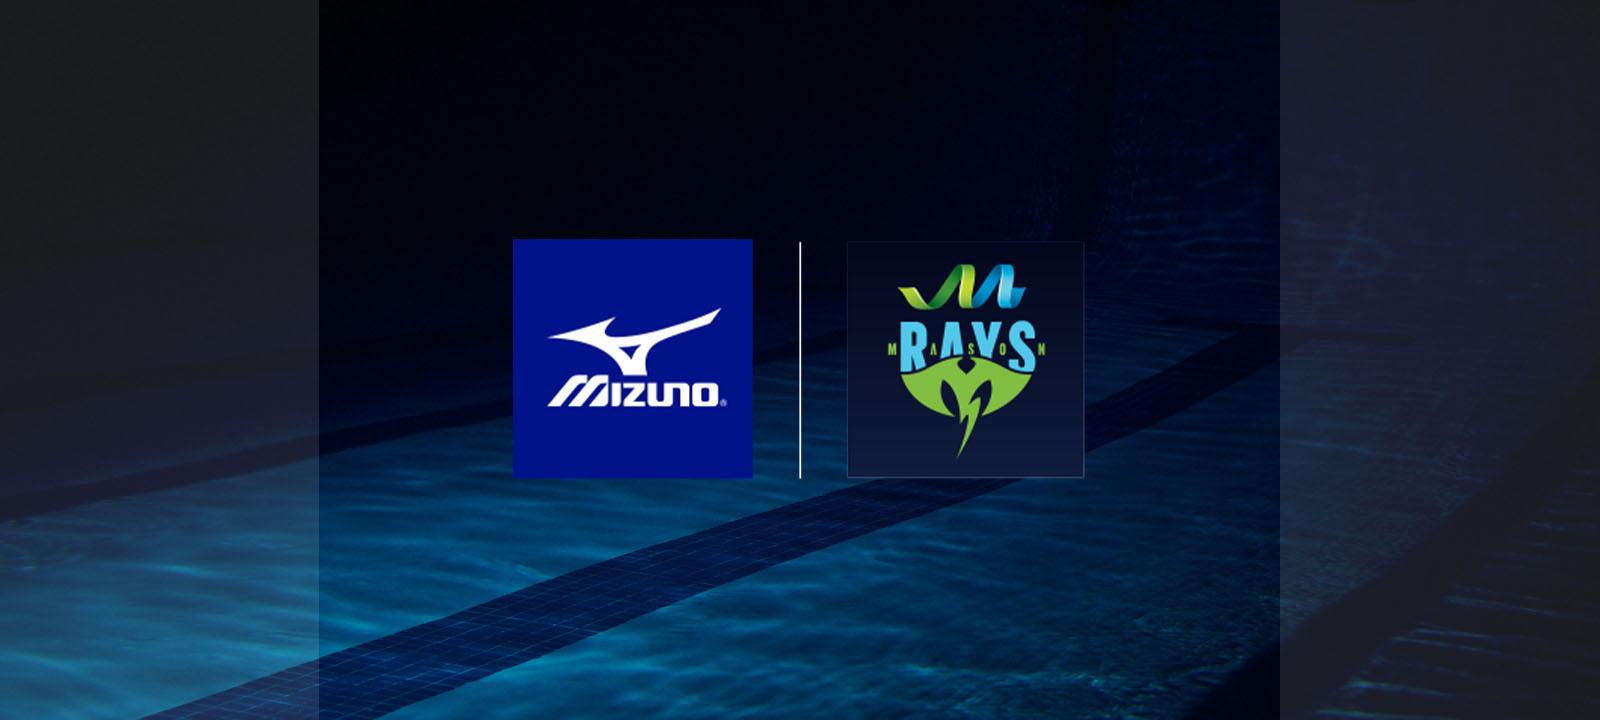 Mizuno USA Becomes Official Sponsor of the Mason Manta Rays